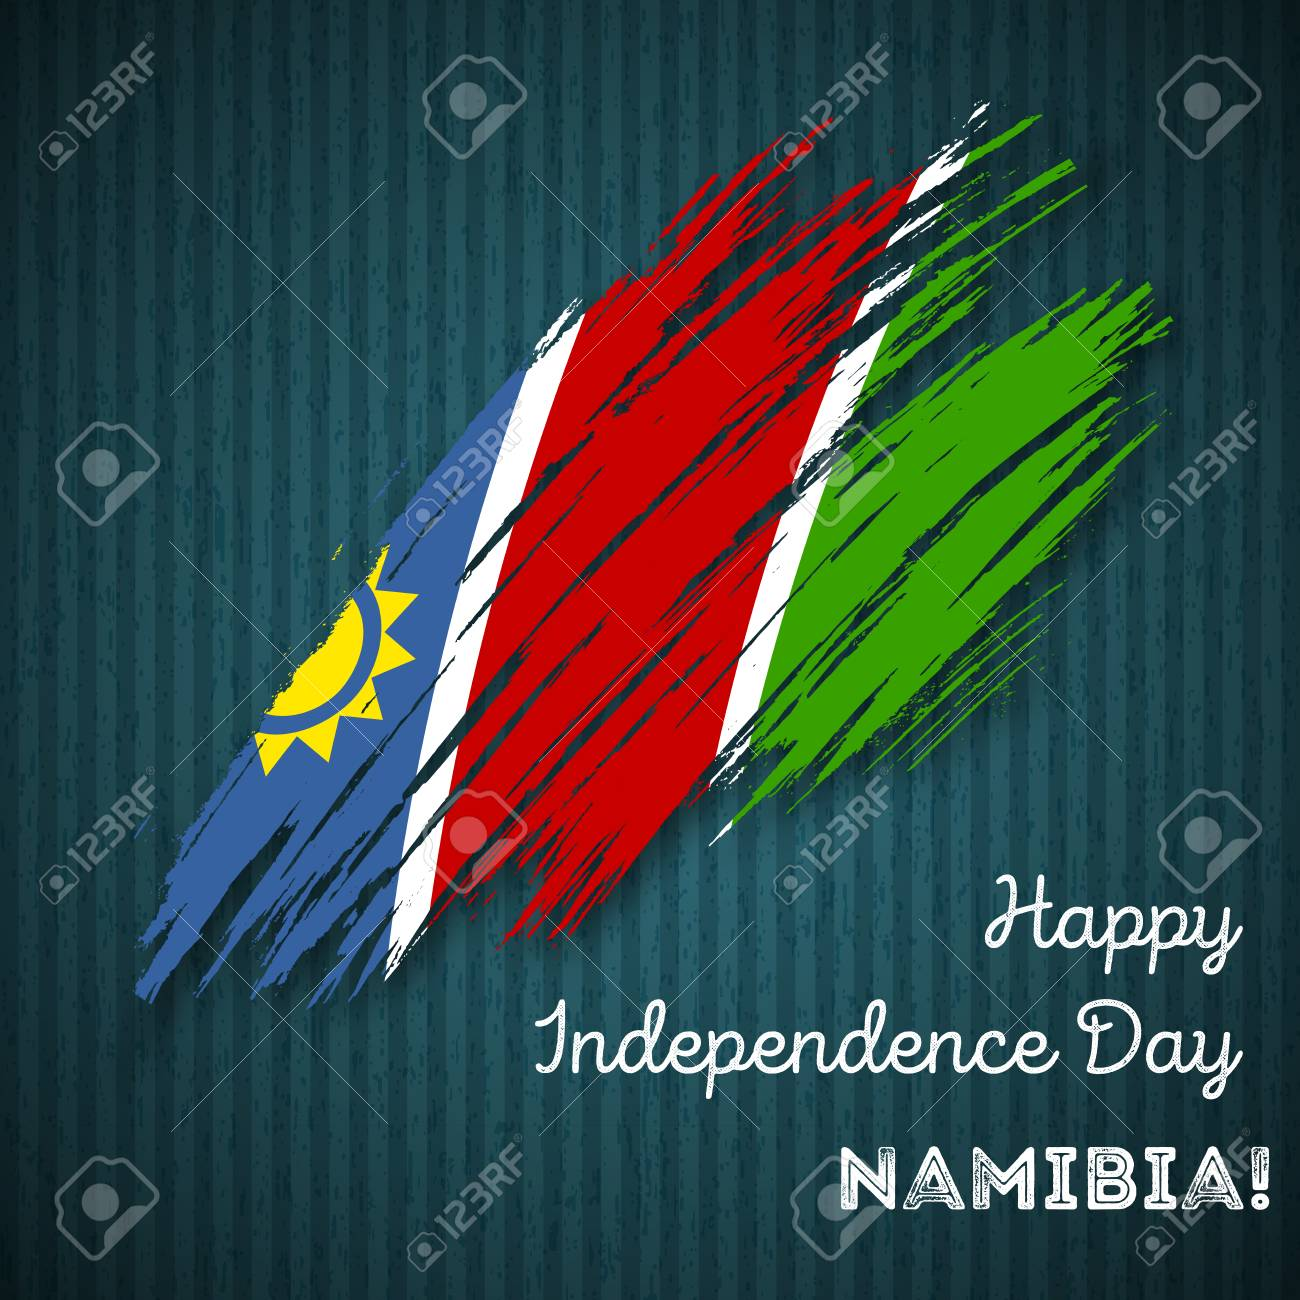 Namibia Independence Day Patriotic Design  Expressive Brush Stroke